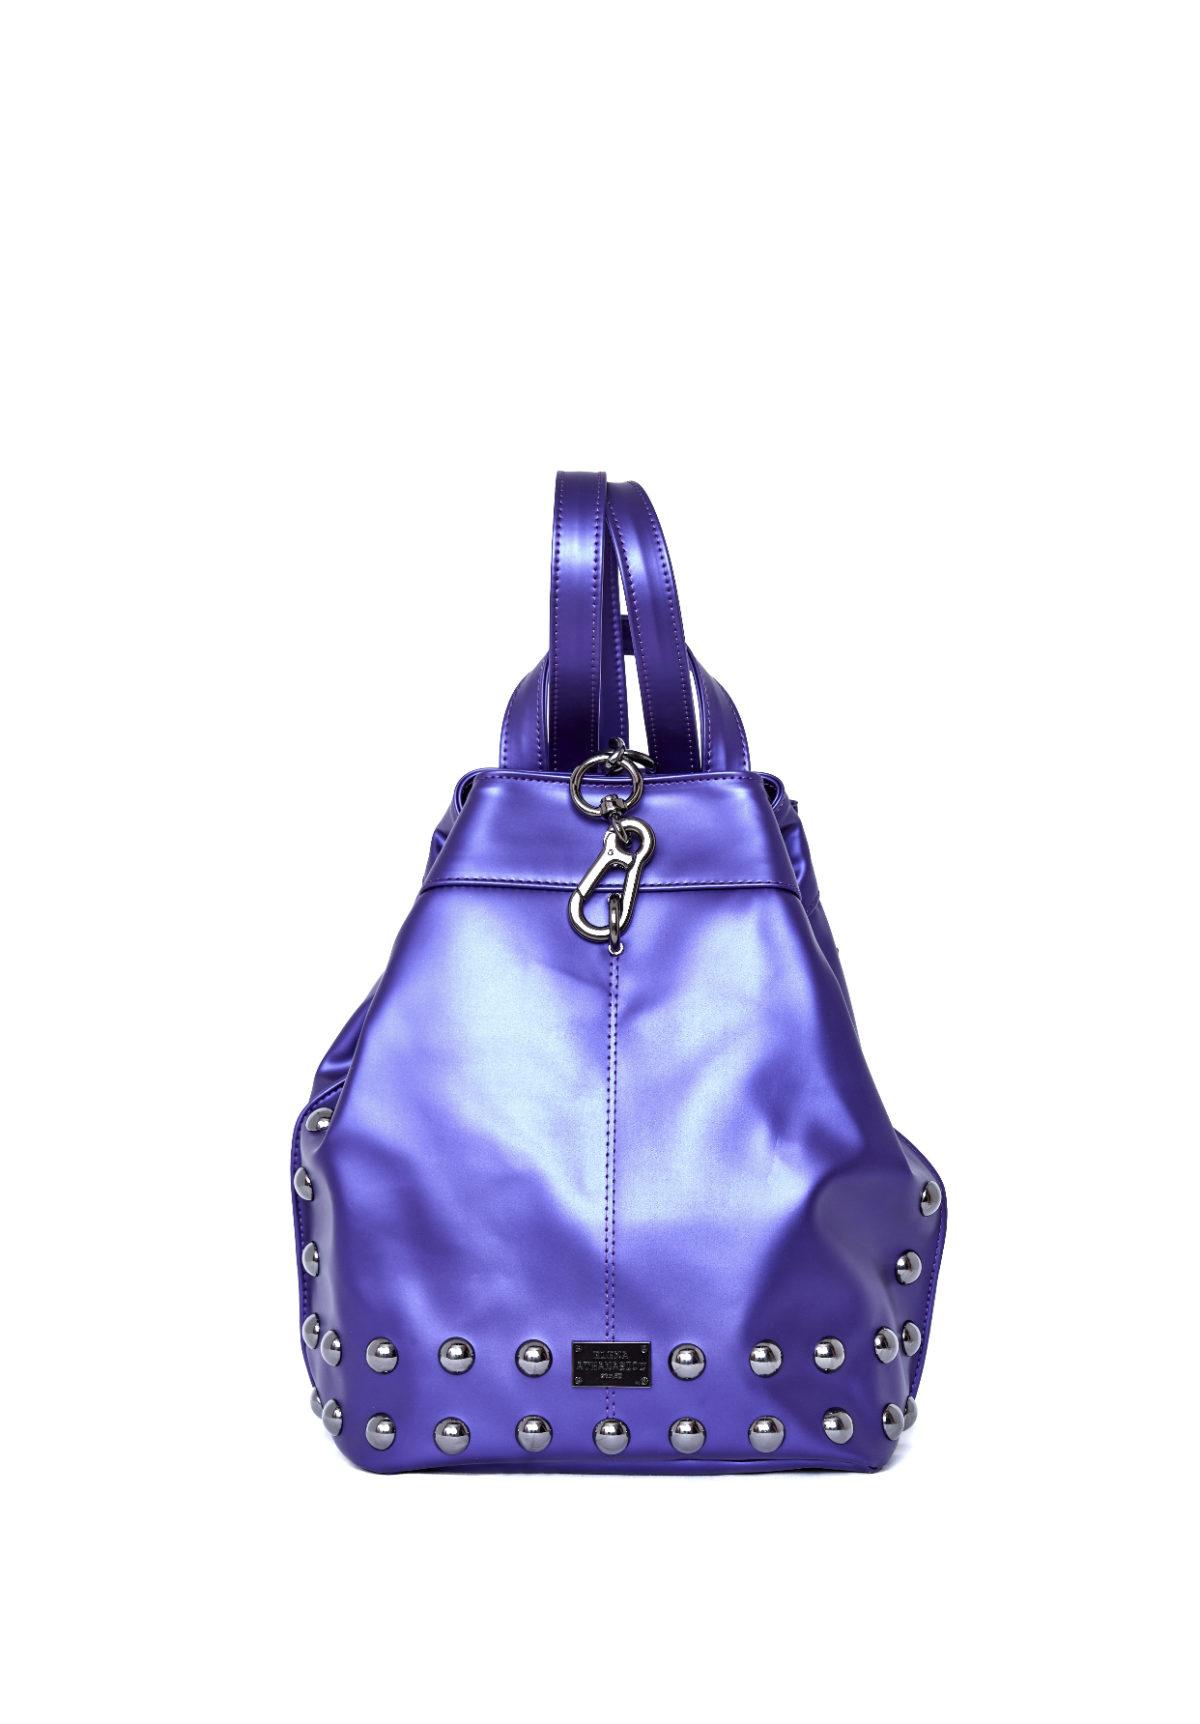 elena athanasiou bags backpack electric purple